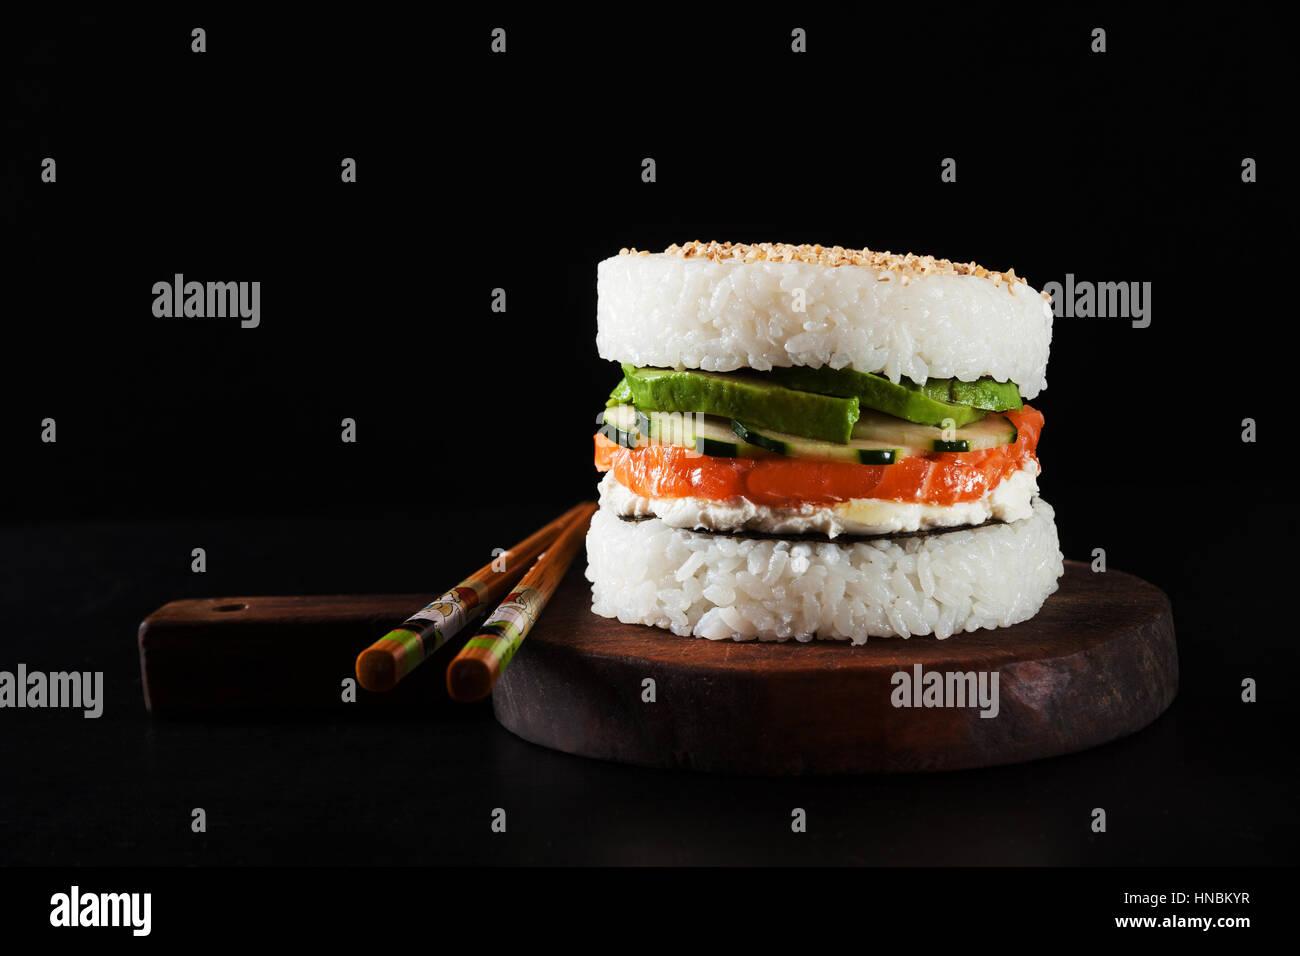 Sushi Menu With Burger Made From Rice And Smoked Salmon Avocado